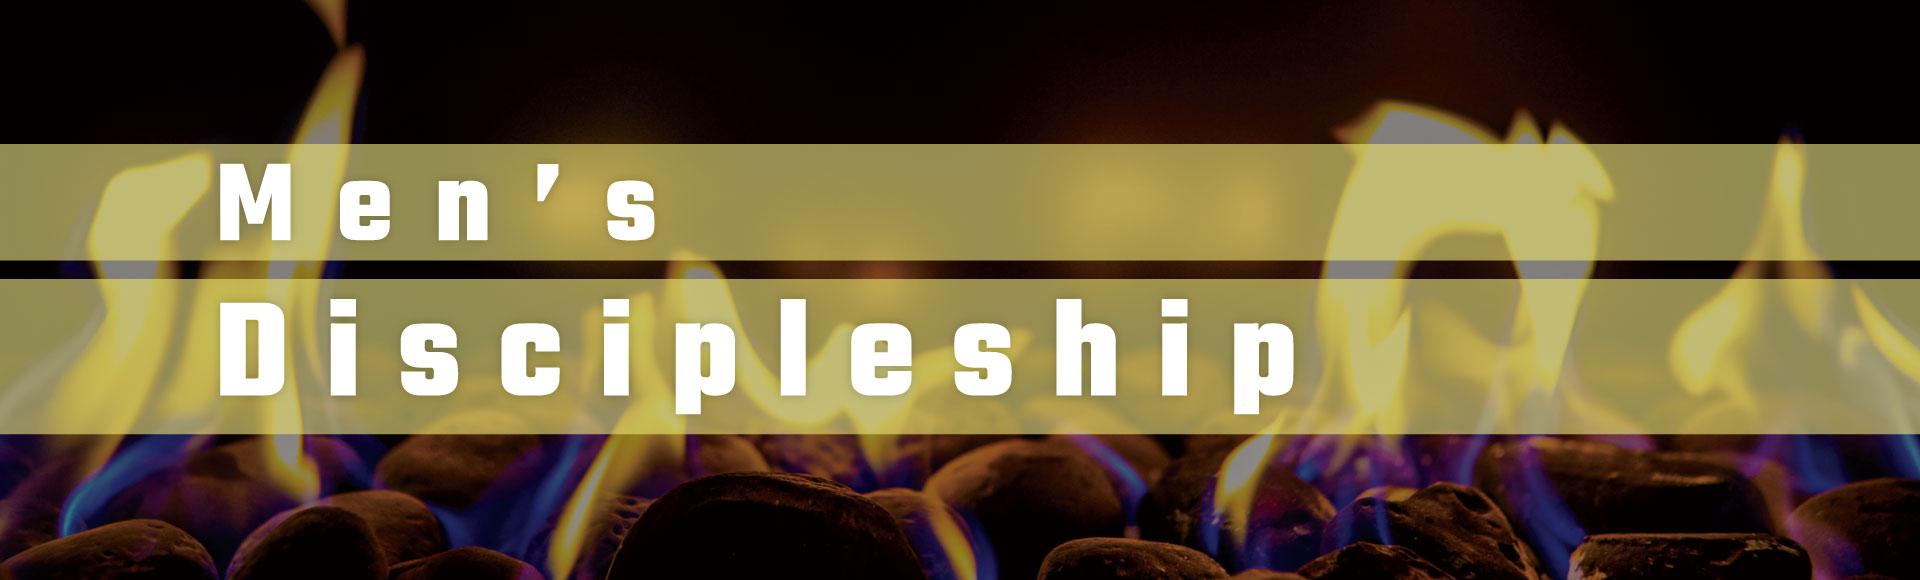 mens-discipleship-1920x580-web